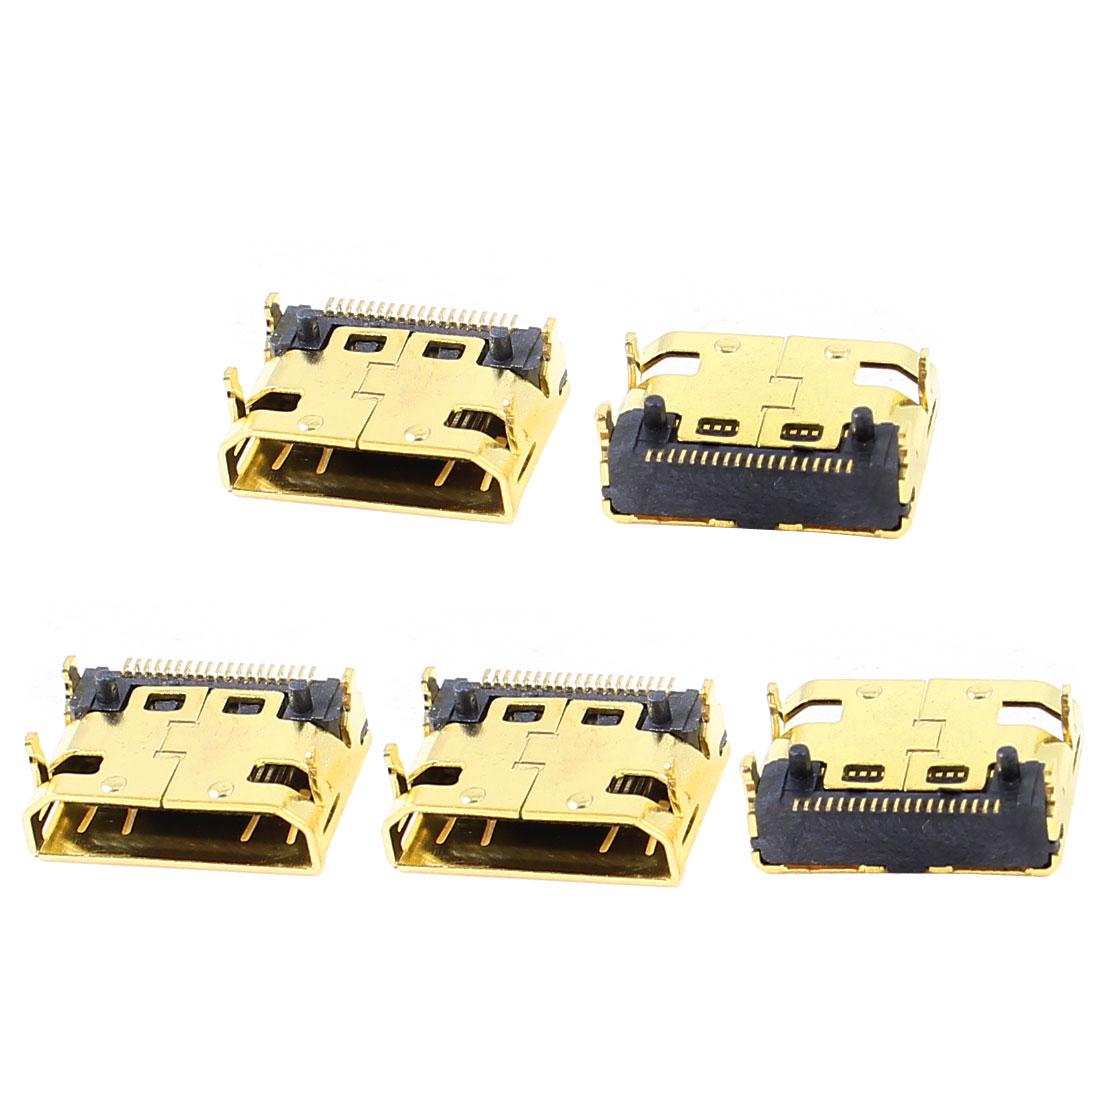 Audio Signal Mini HDMI 19 Pins Female Connector Socket 5 Pcs